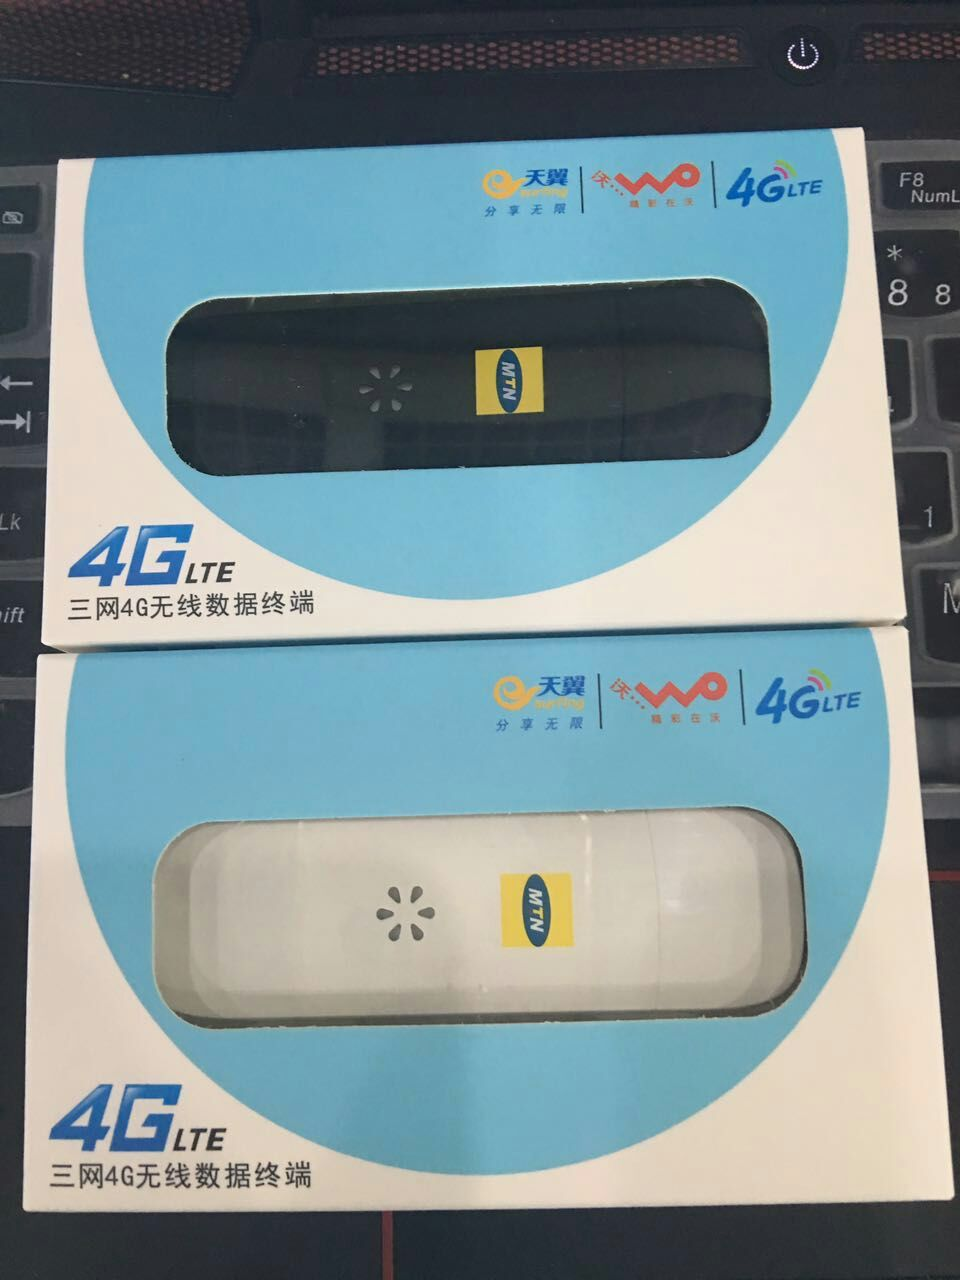 Mobile Broadband UNLOCKED ZTE MF831 Cat4 LTE 4G USB modem white replace MF823 steve jey сумка на плечо